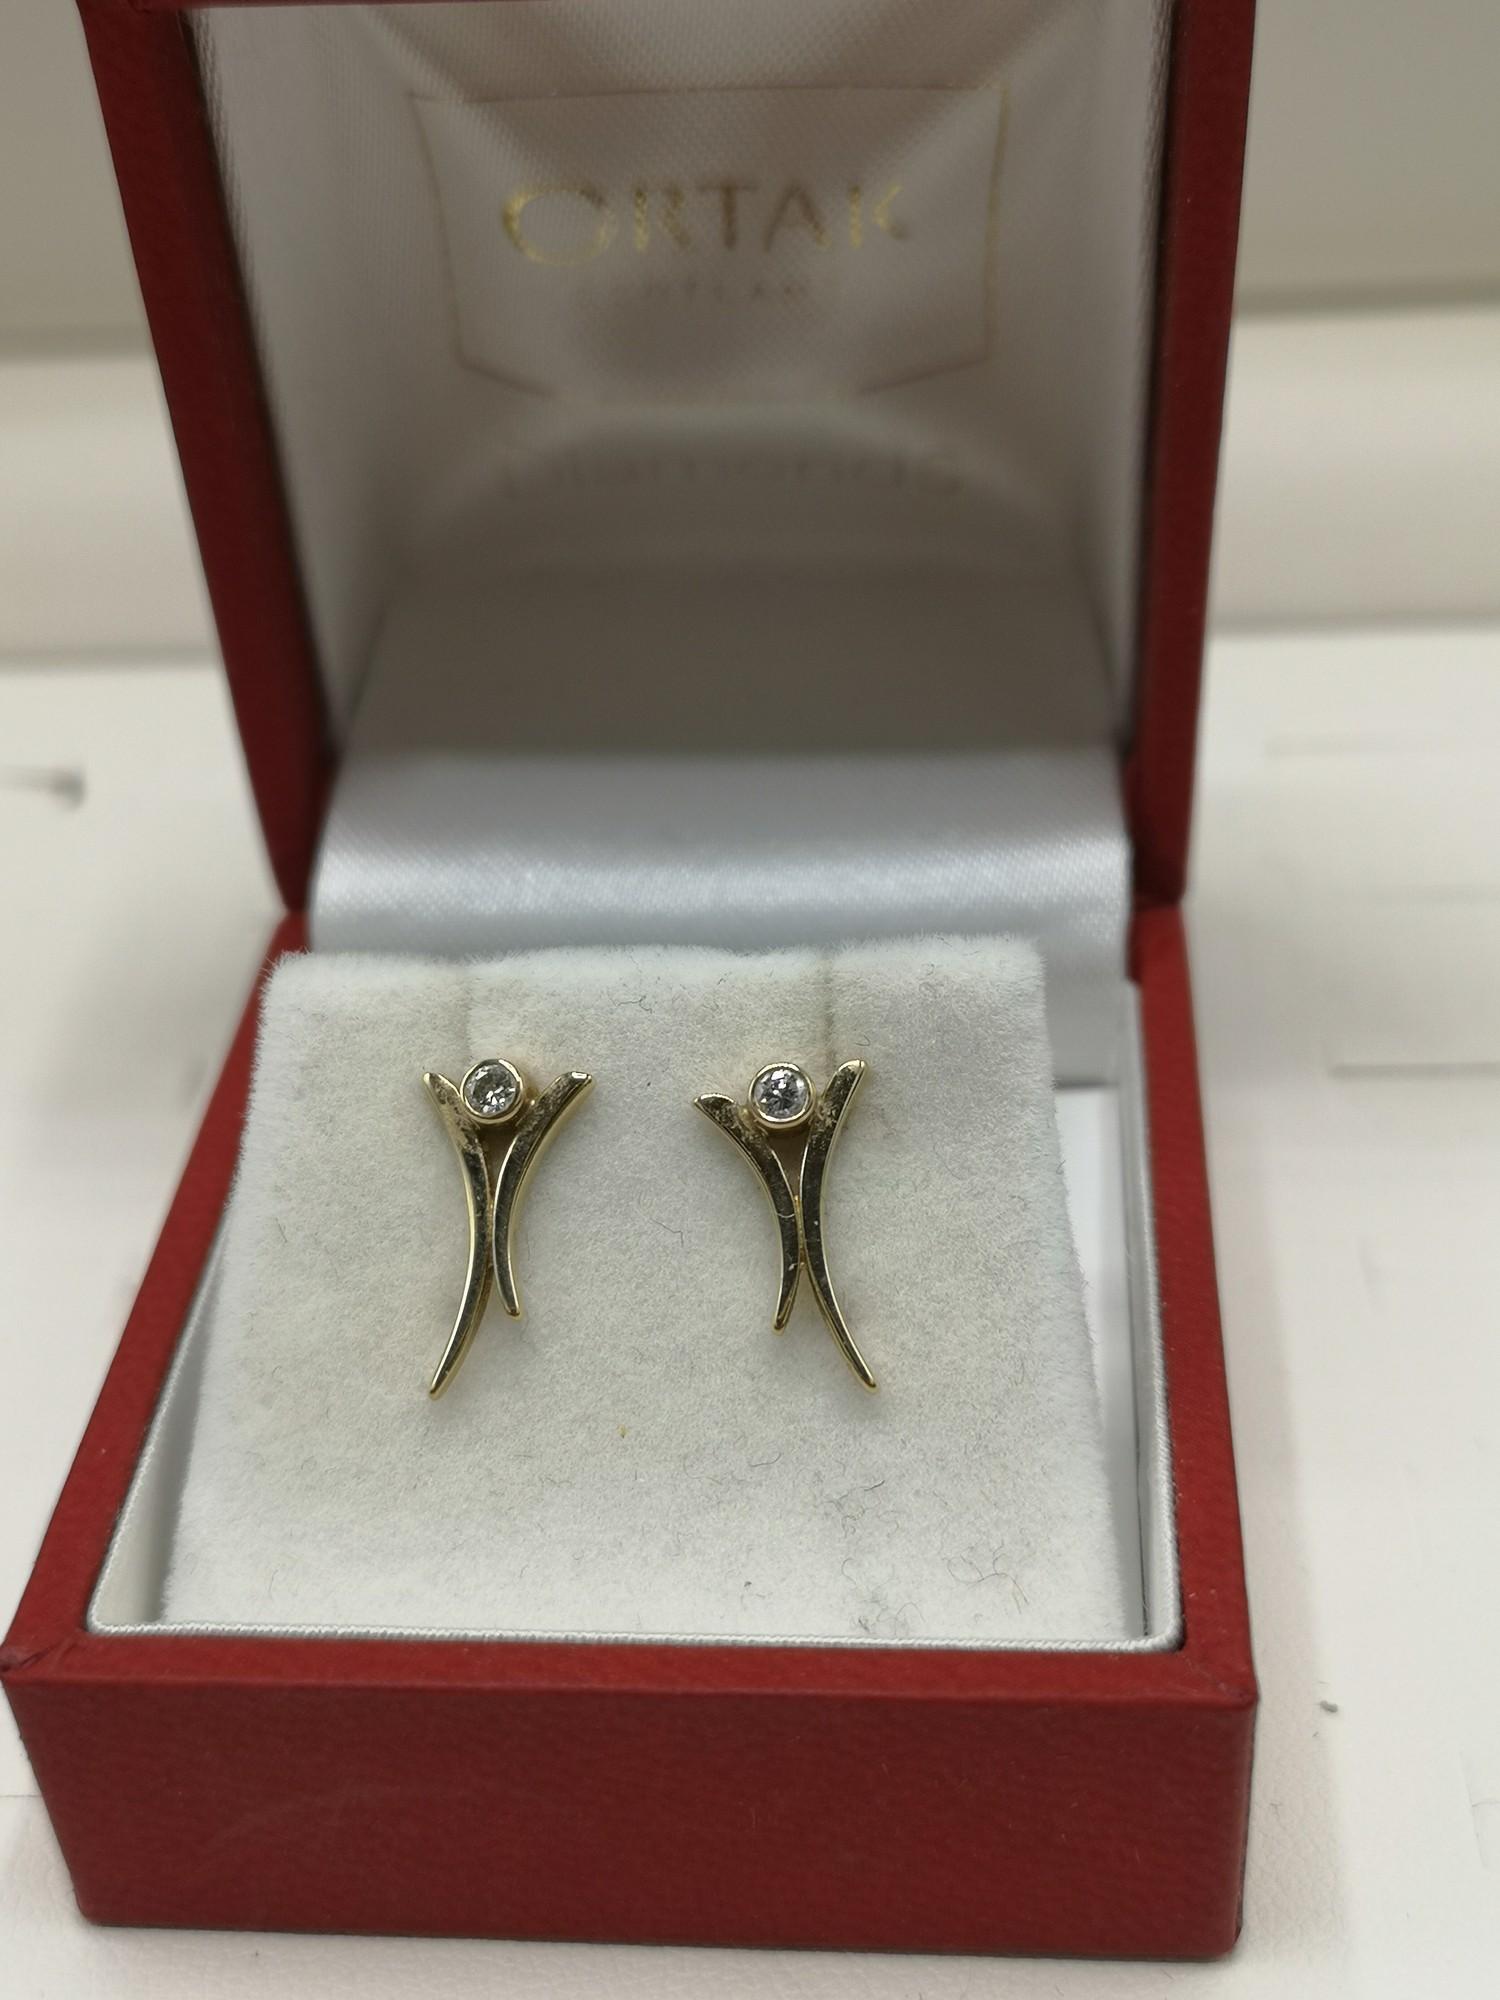 9ct gold ortak earrings set with diamonds. - Image 2 of 2